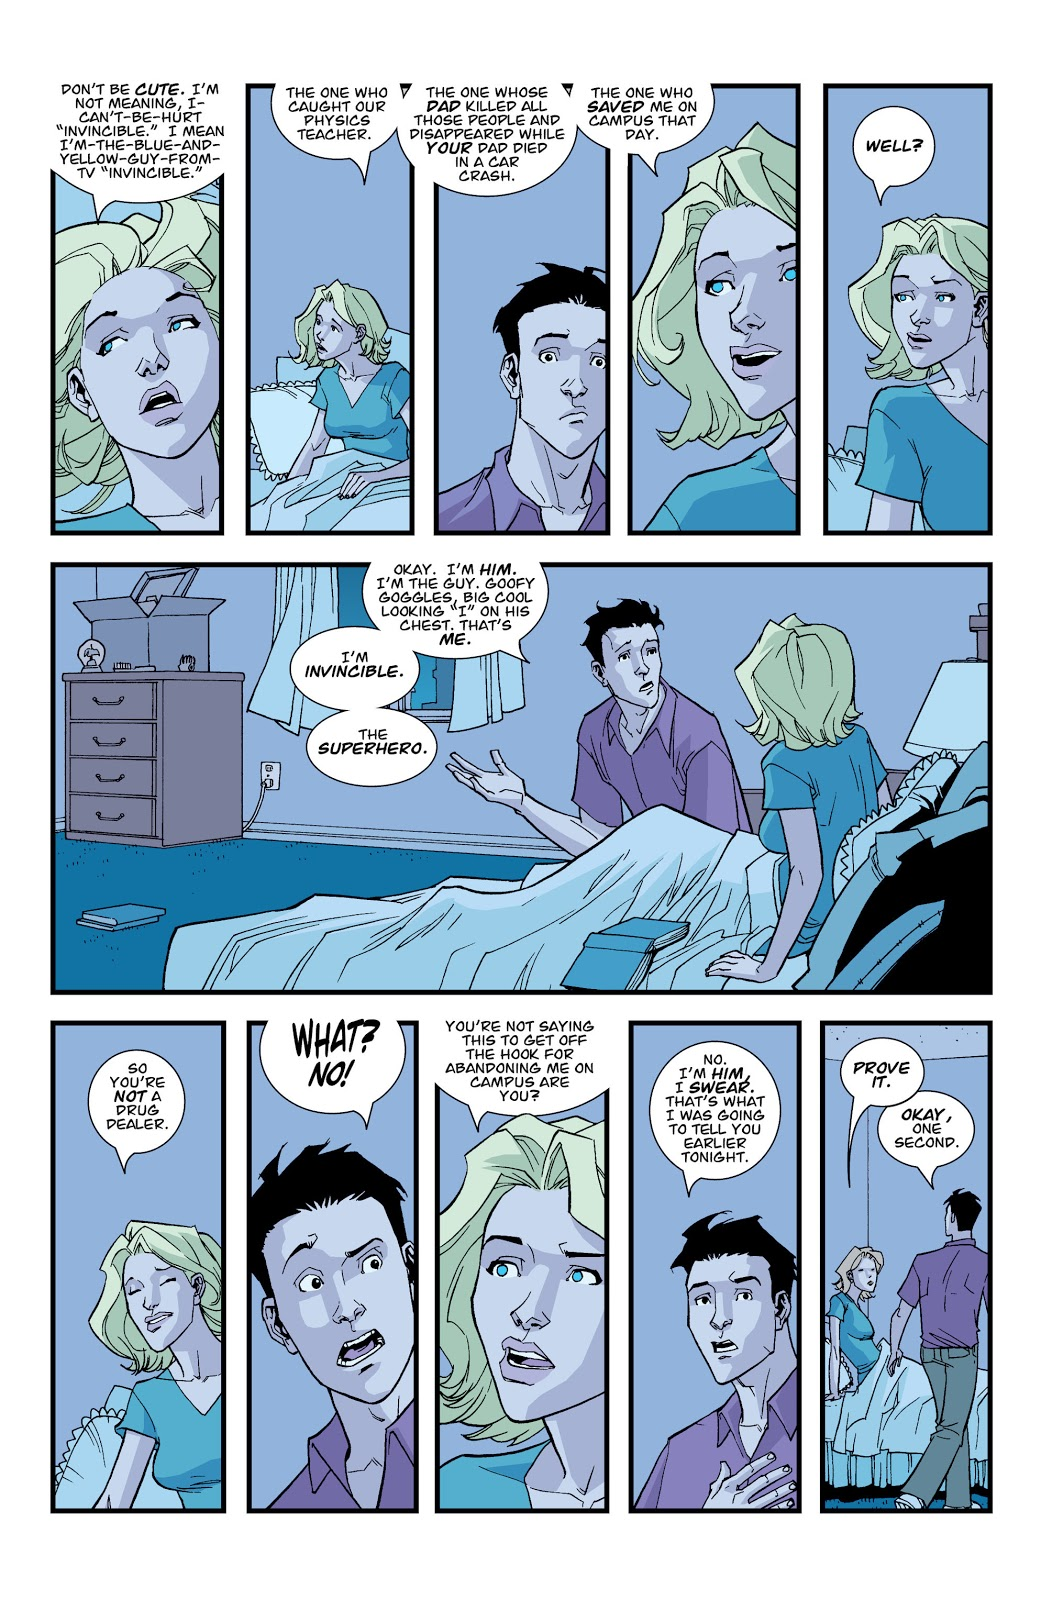 Mark Grayson Tells His Girlfriend He's Invincible